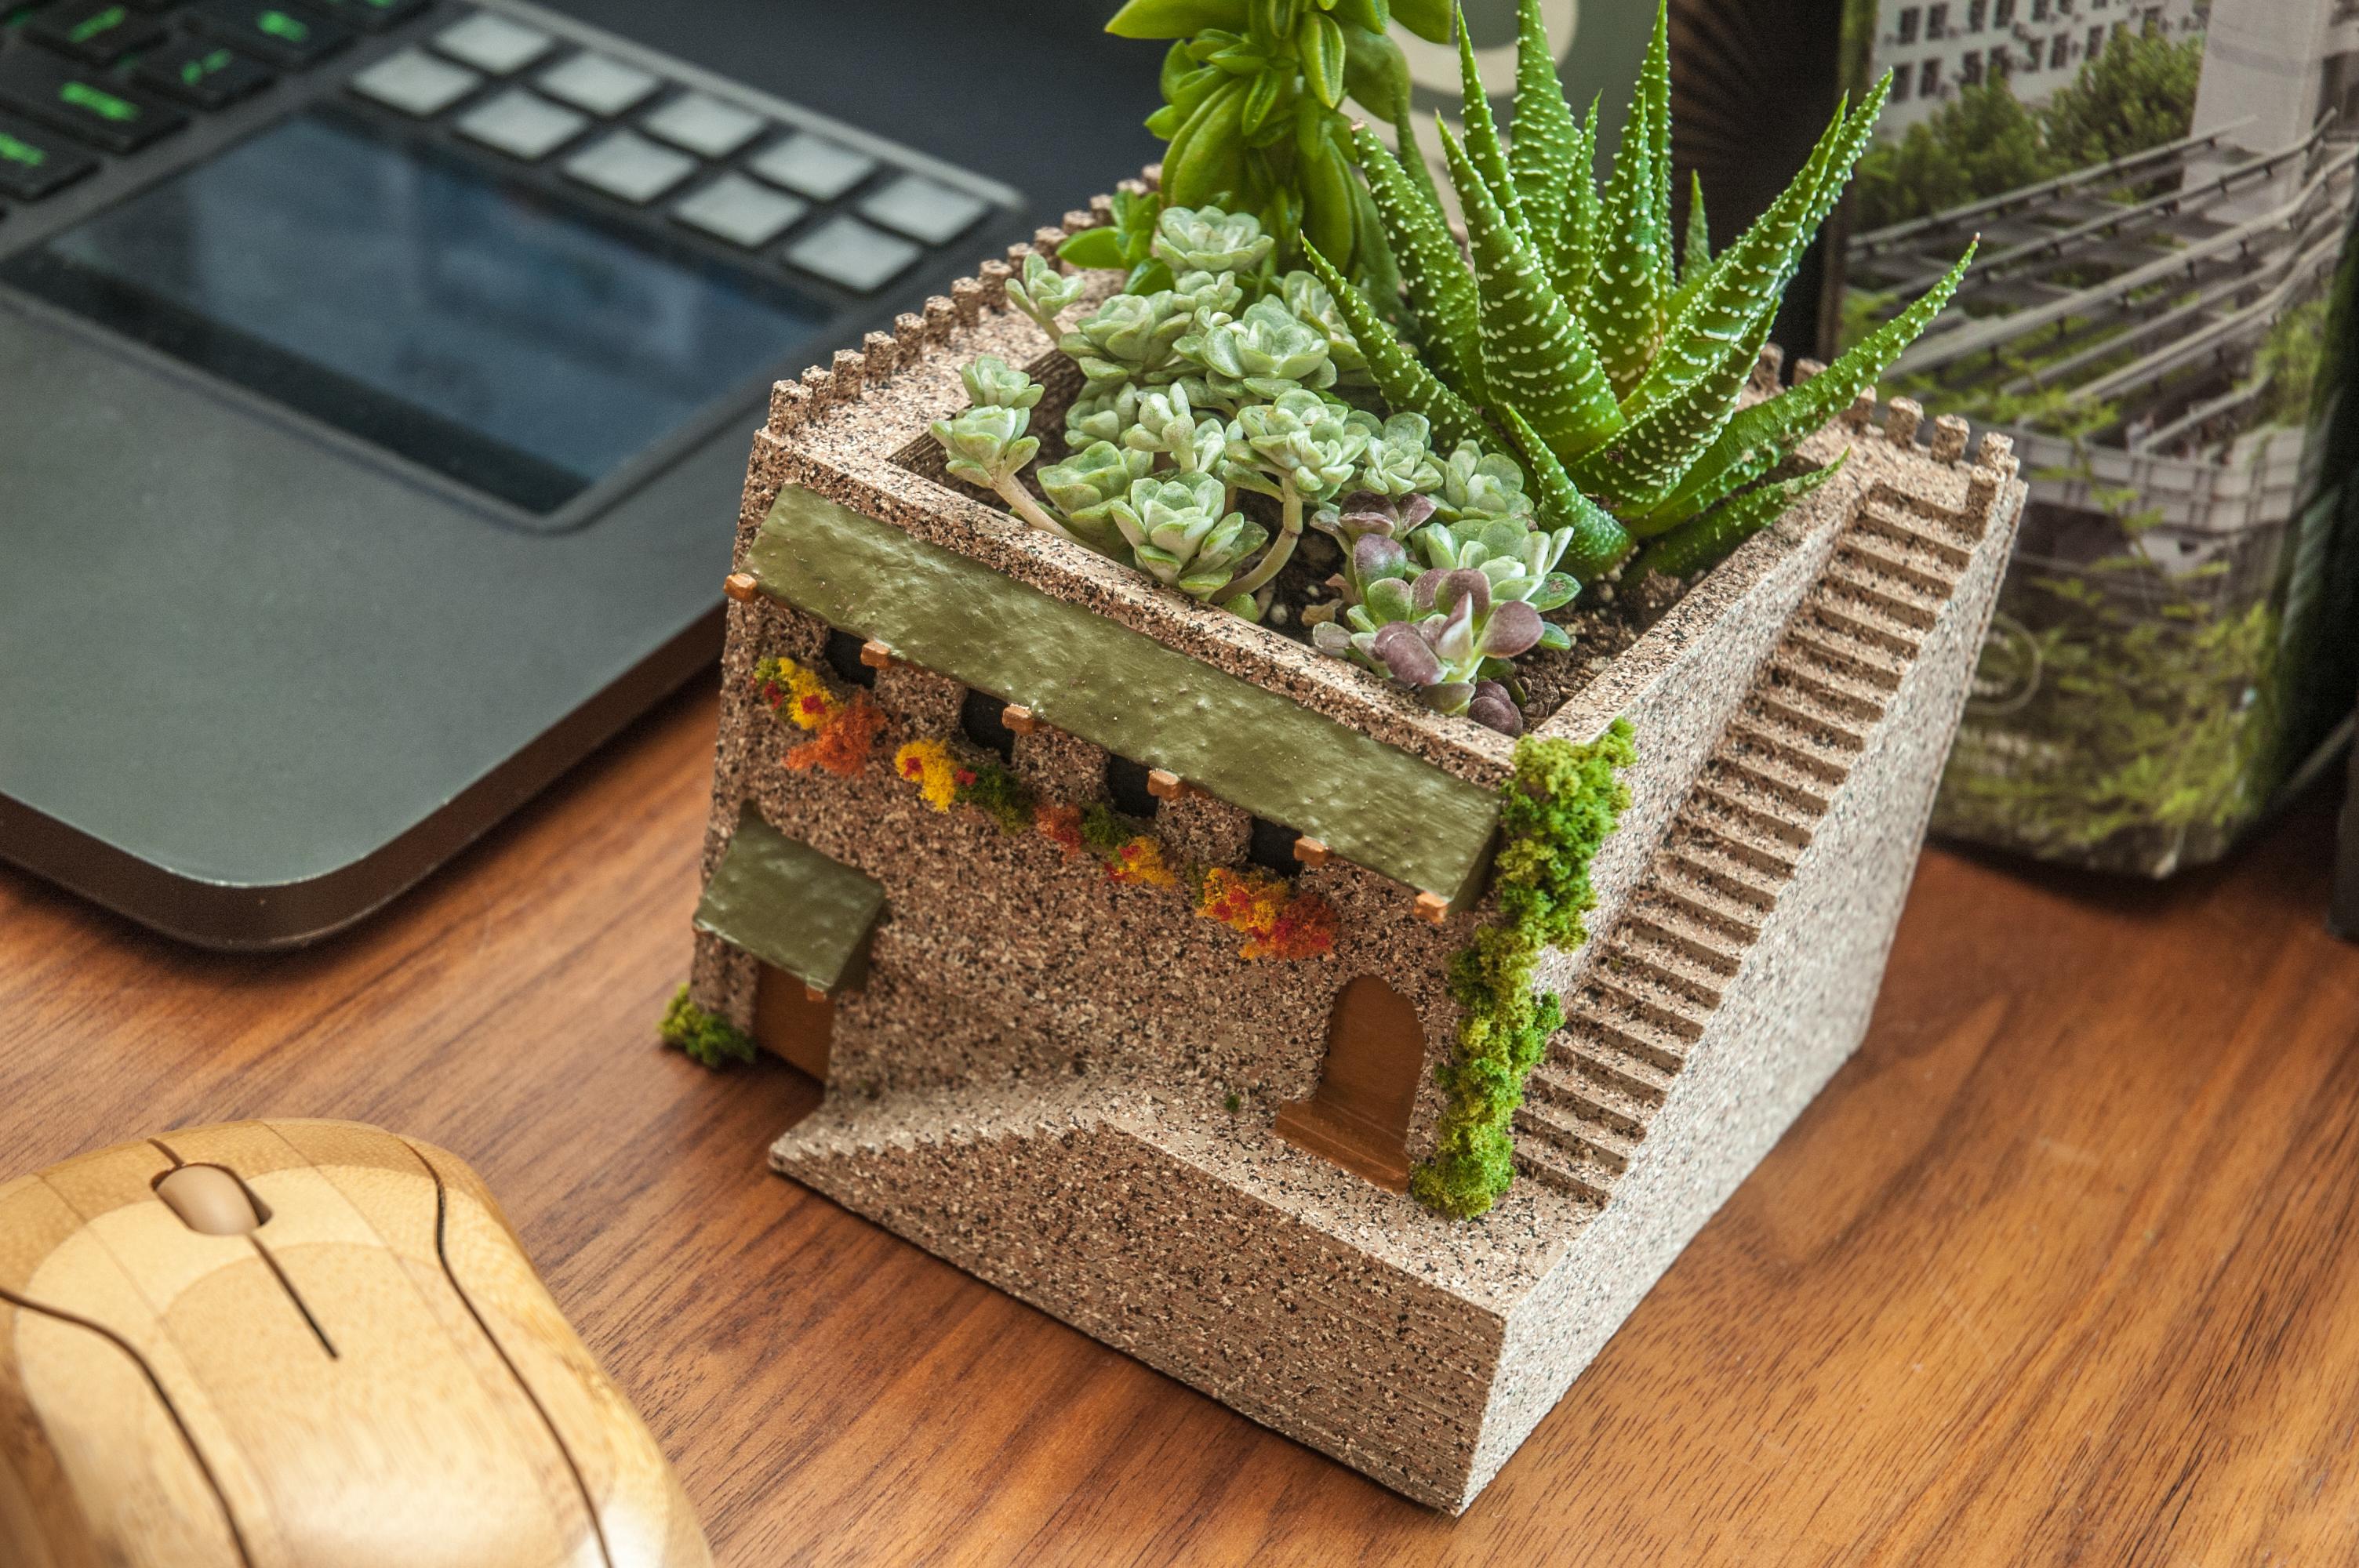 3D Printed Mini Middle Eastern Villa Planter by yuriysklyar | Pinshape